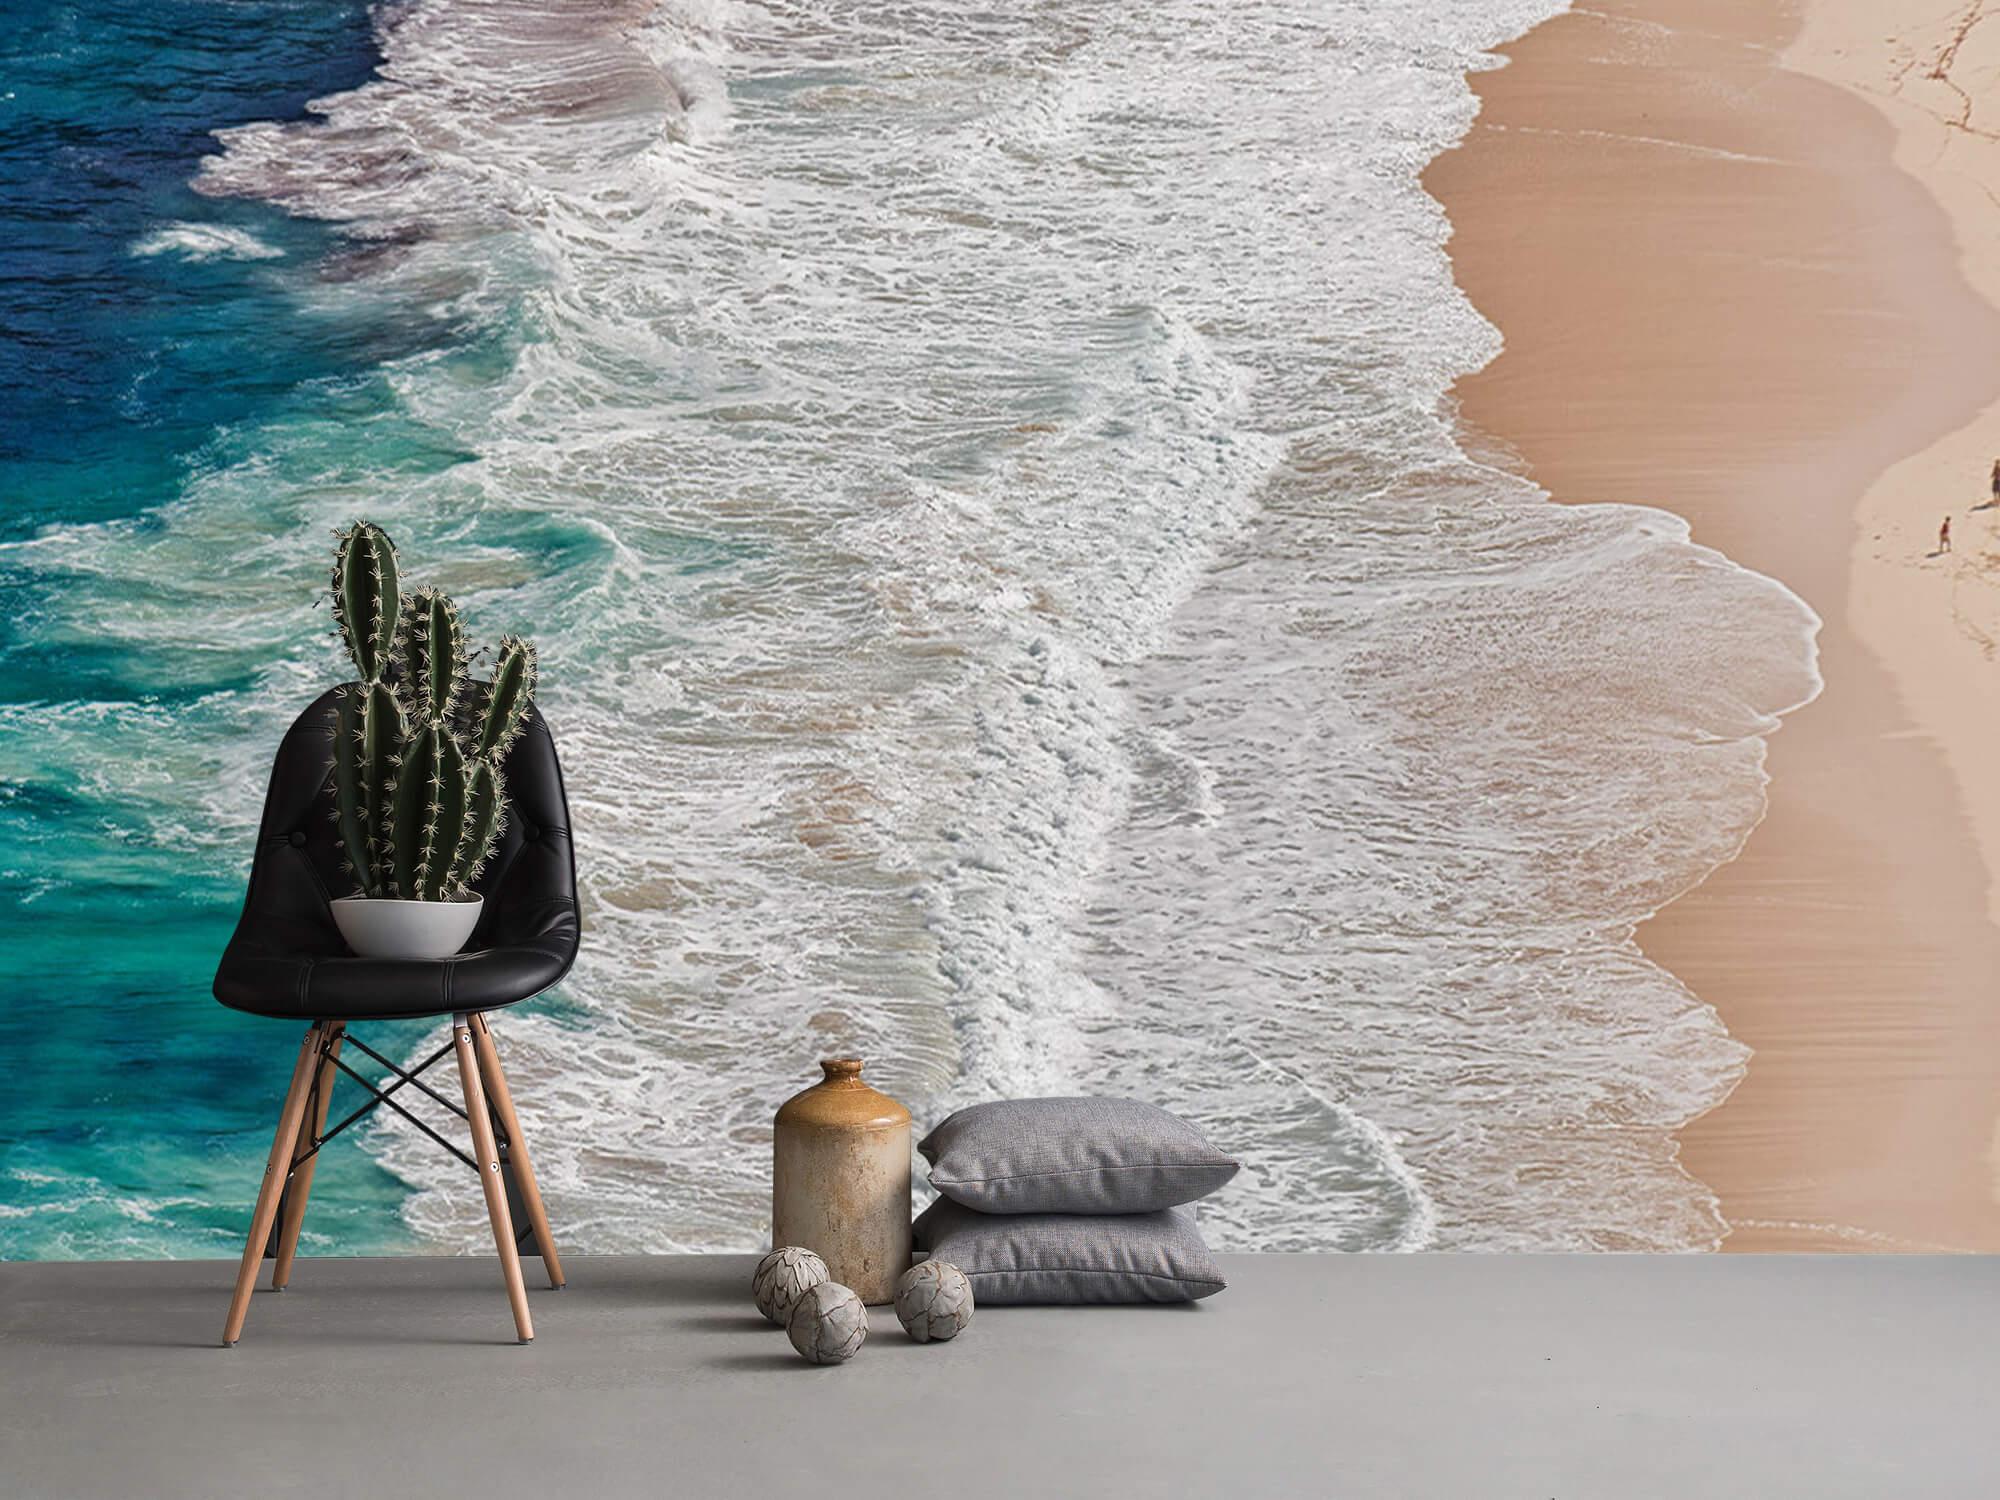 Where the Ocean Ends... 5